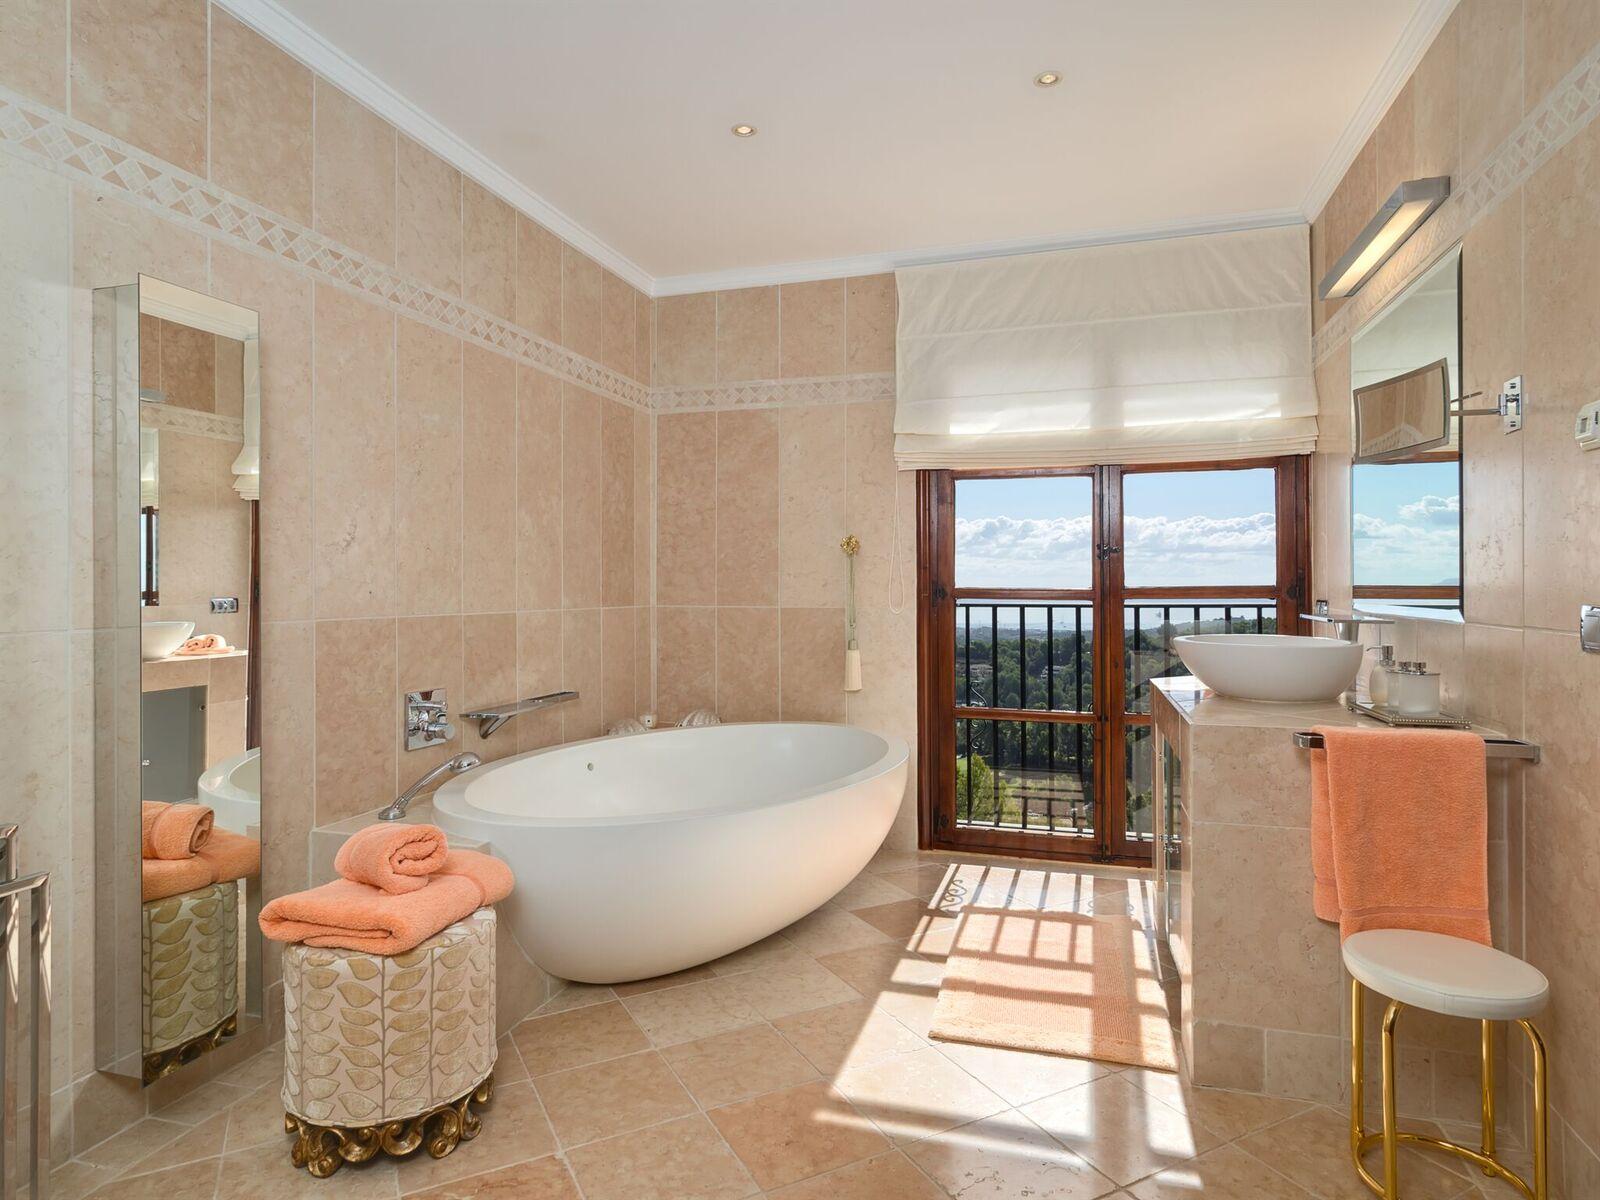 Destaca la bañera de diseño